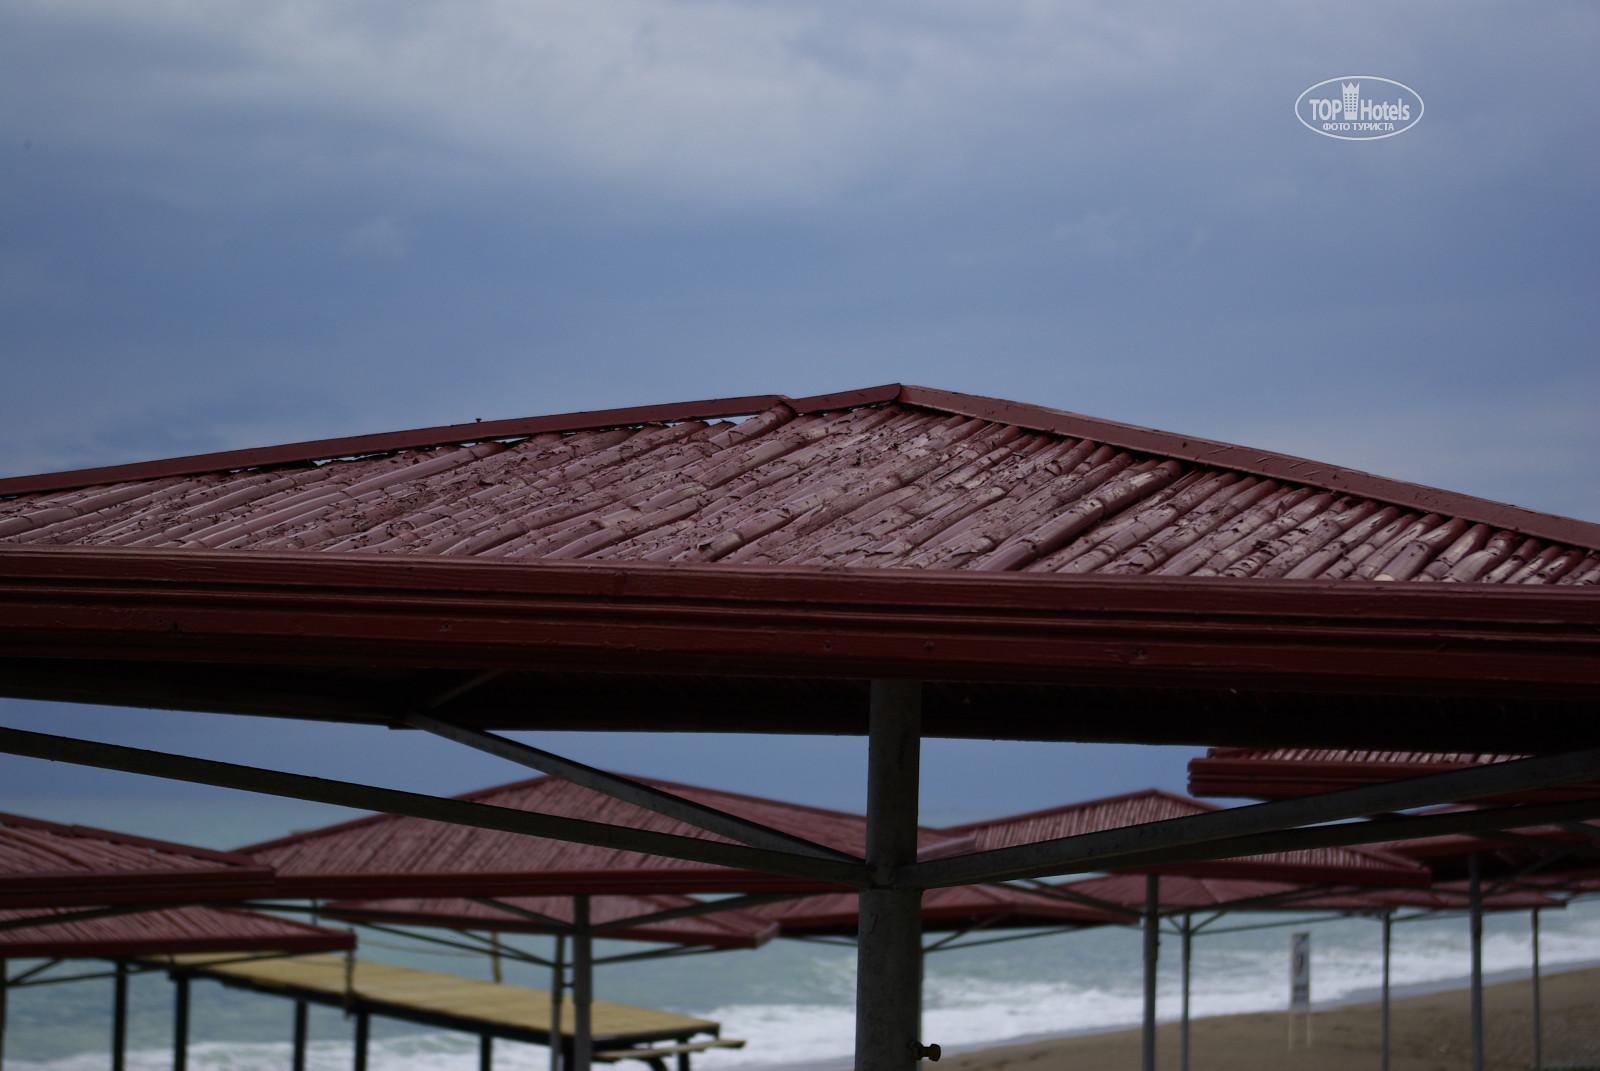 Фото туристов отеля Ali Bey Club Manavgat HV-1. Рейтинг ...: http://tophotels.ru/hotel/al18556/media/gallery?type=2